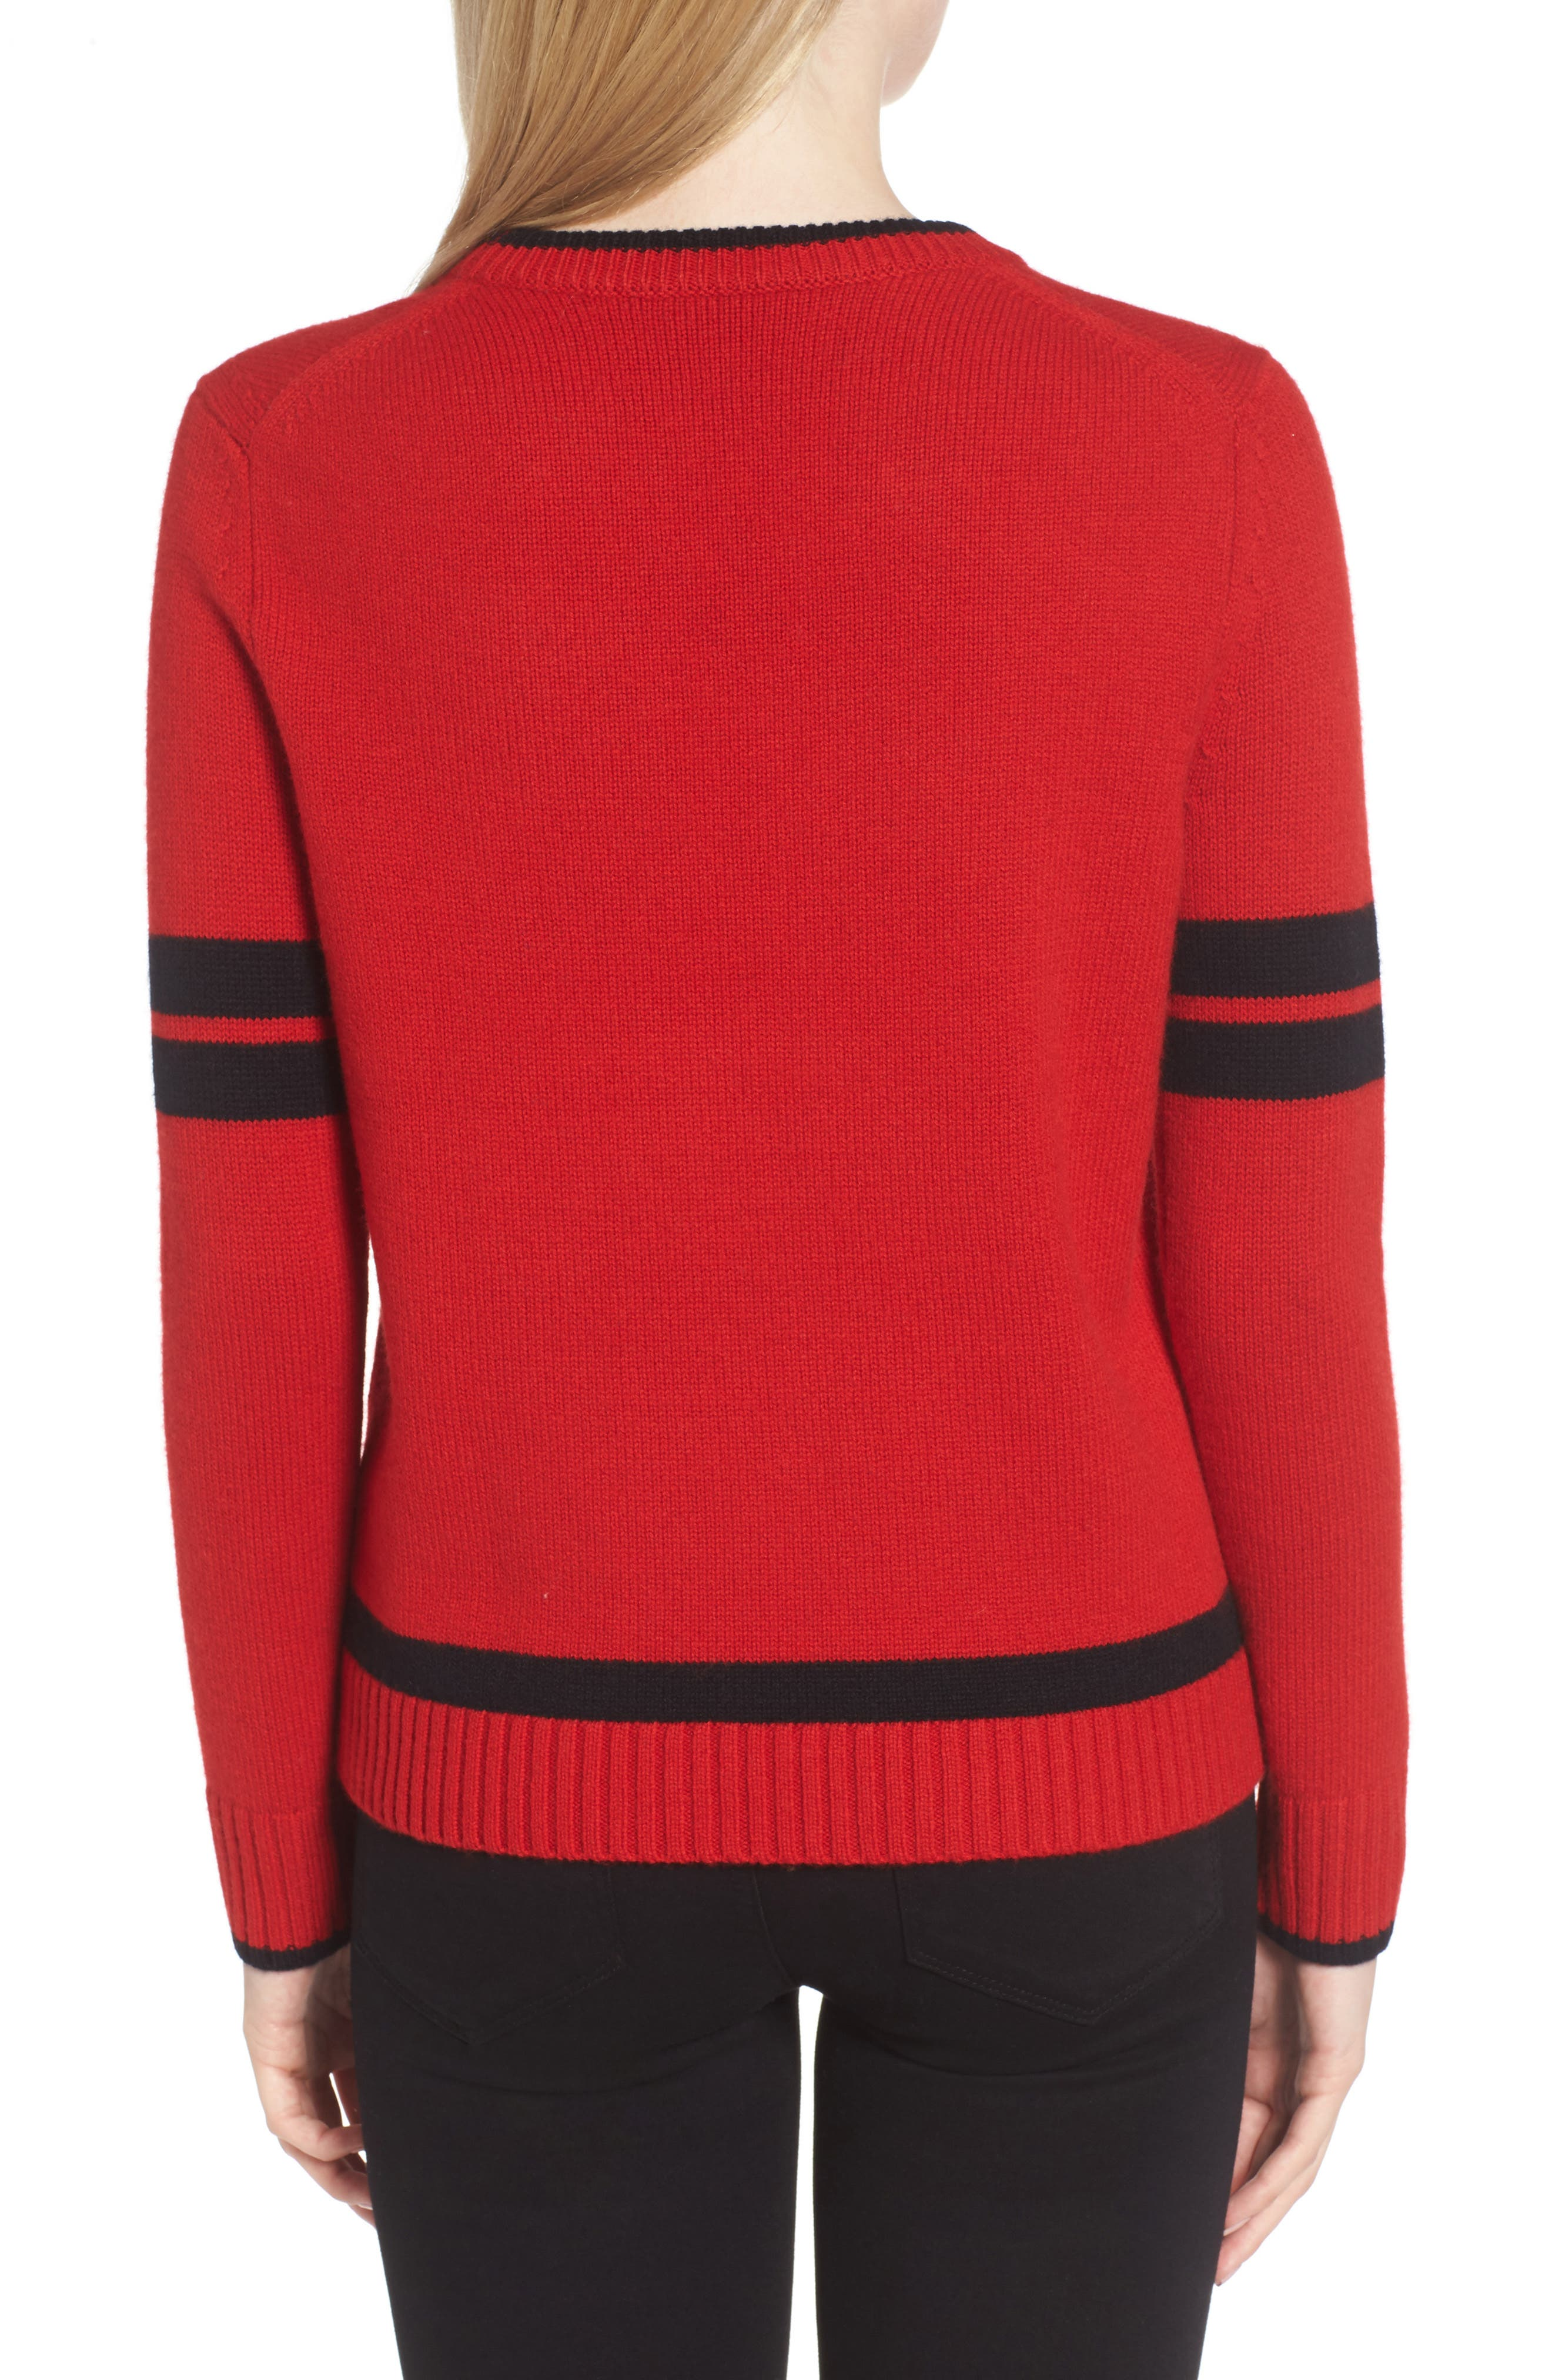 Spirit Sweater,                             Alternate thumbnail 2, color,                             006